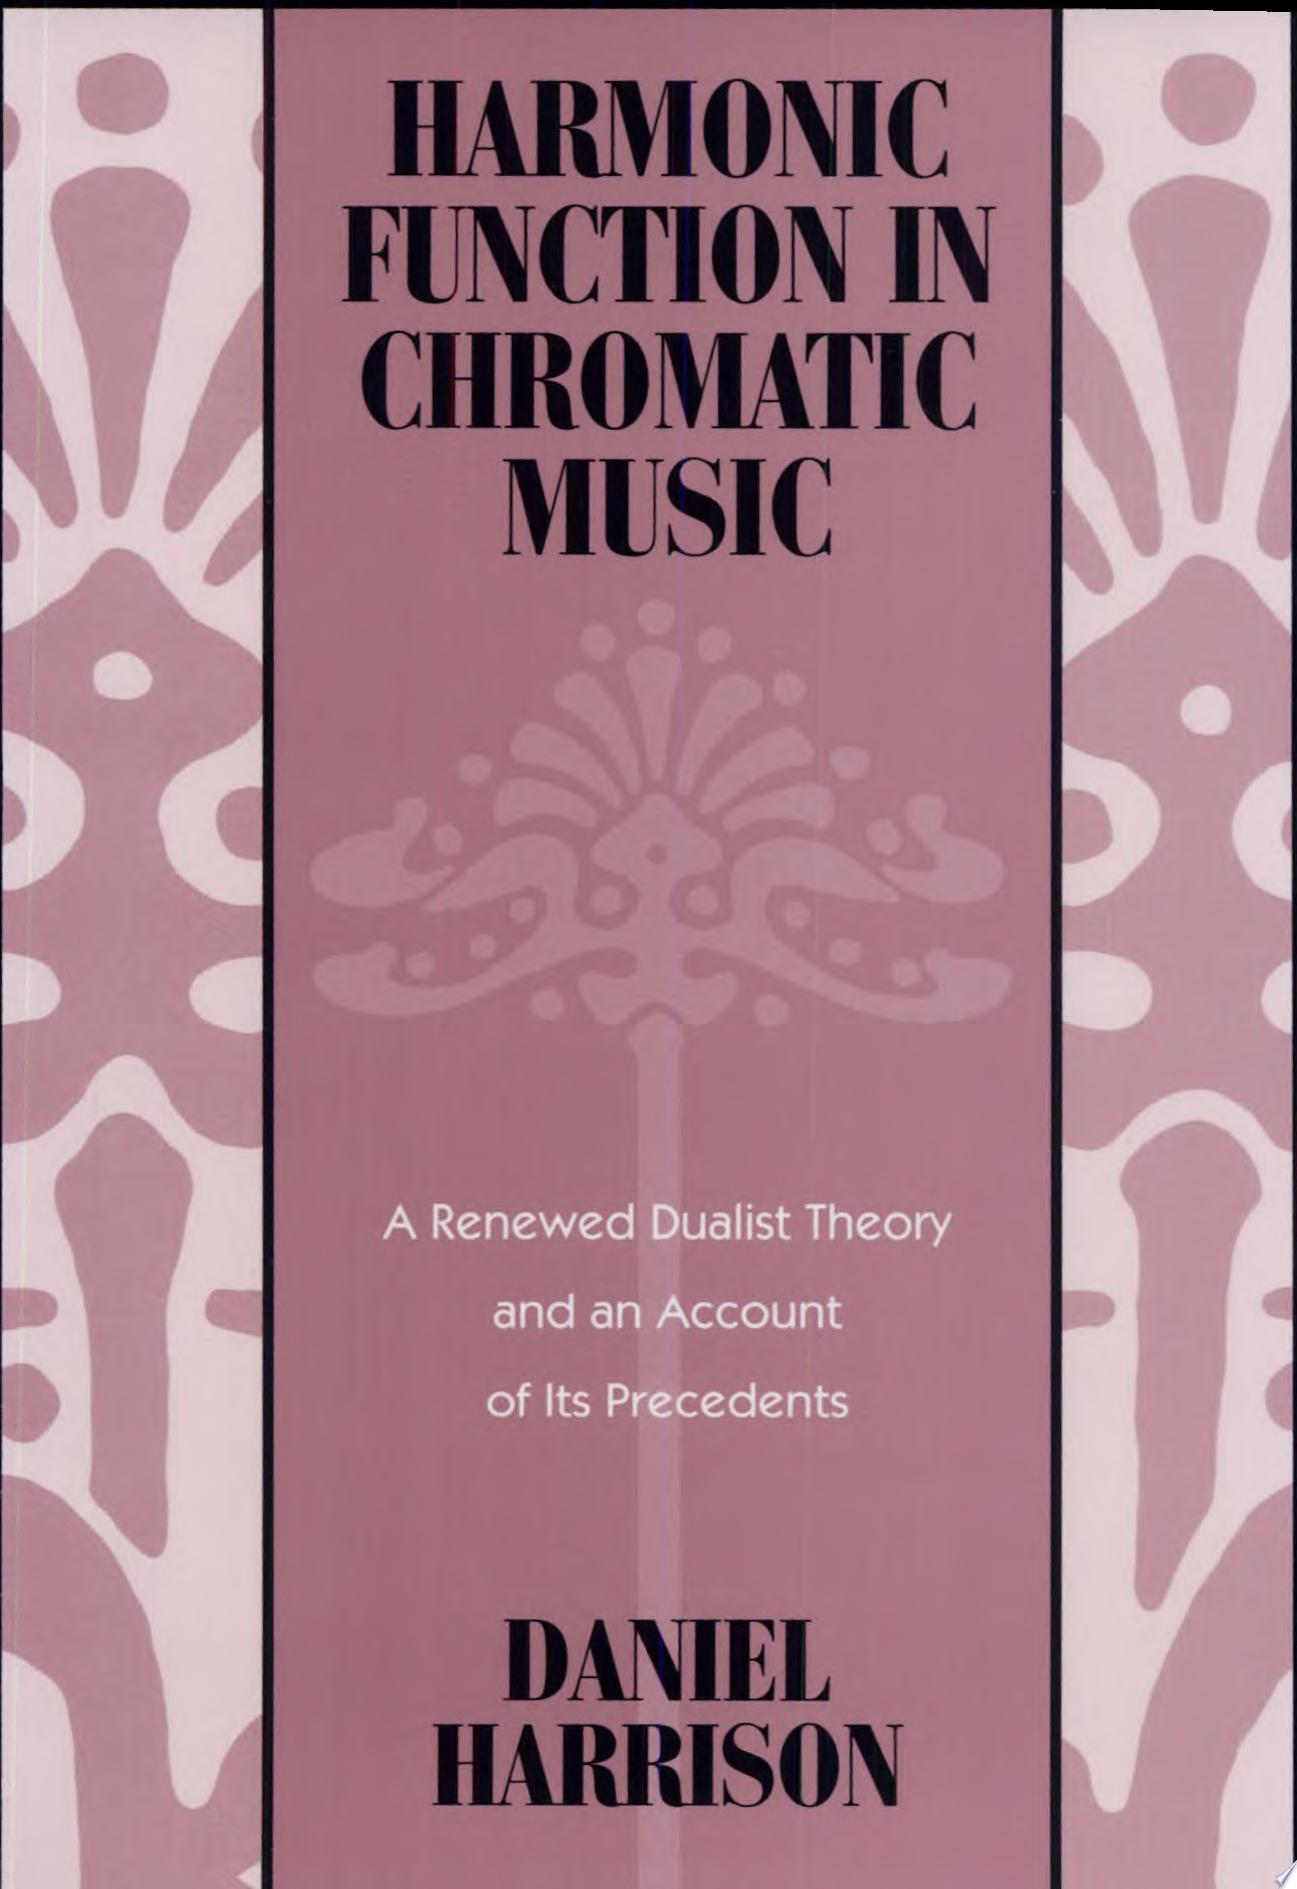 Harmonic Function in Chromatic Music